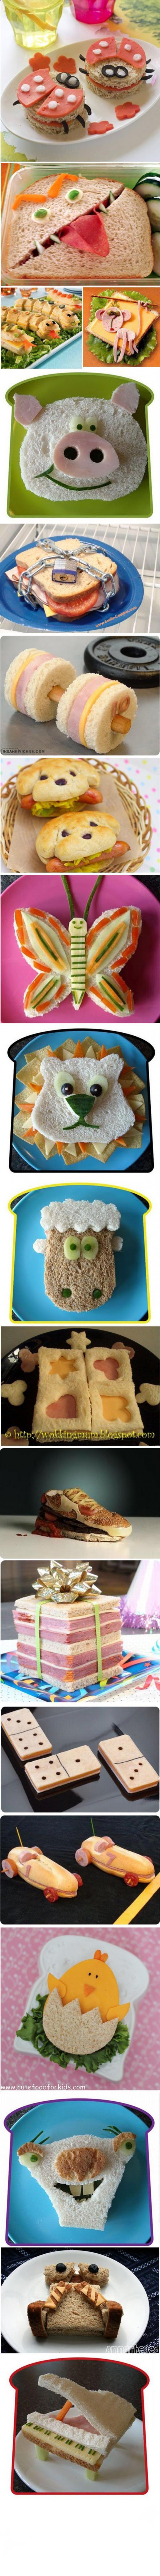 Sandwichs originaux